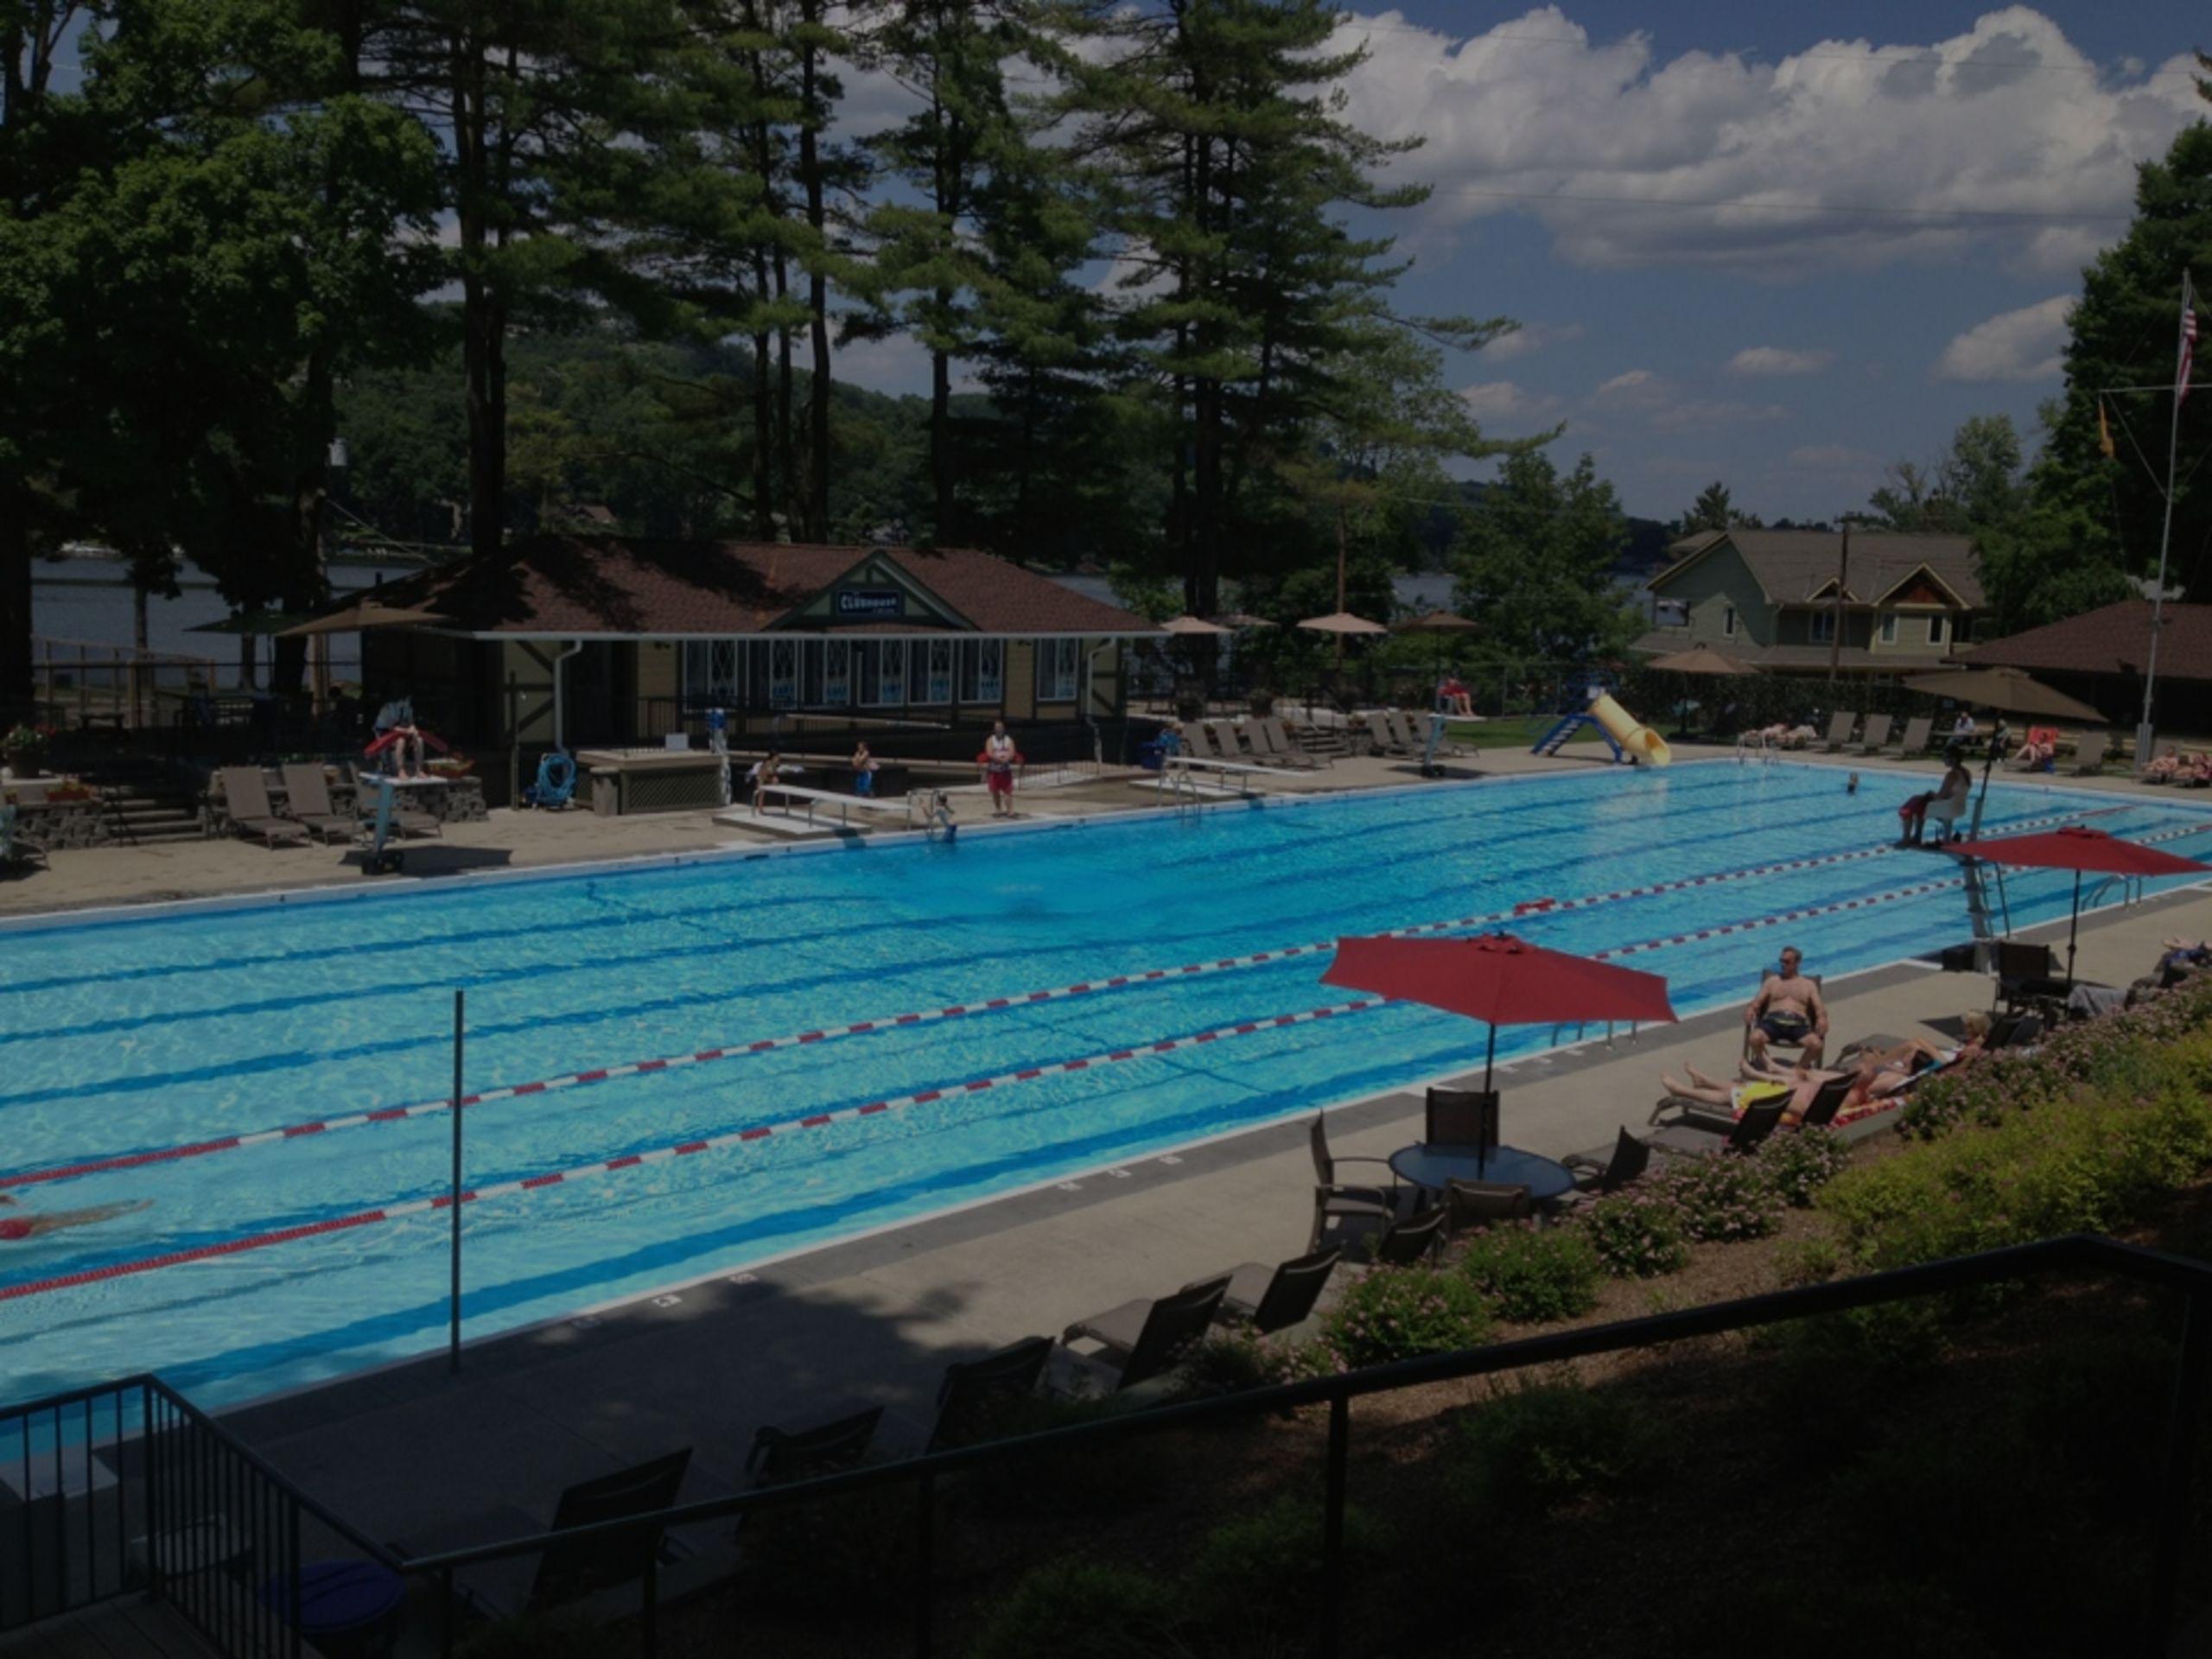 Things to do in Lake Mohawk – Lake Mohawk Pool Sparta, NJ